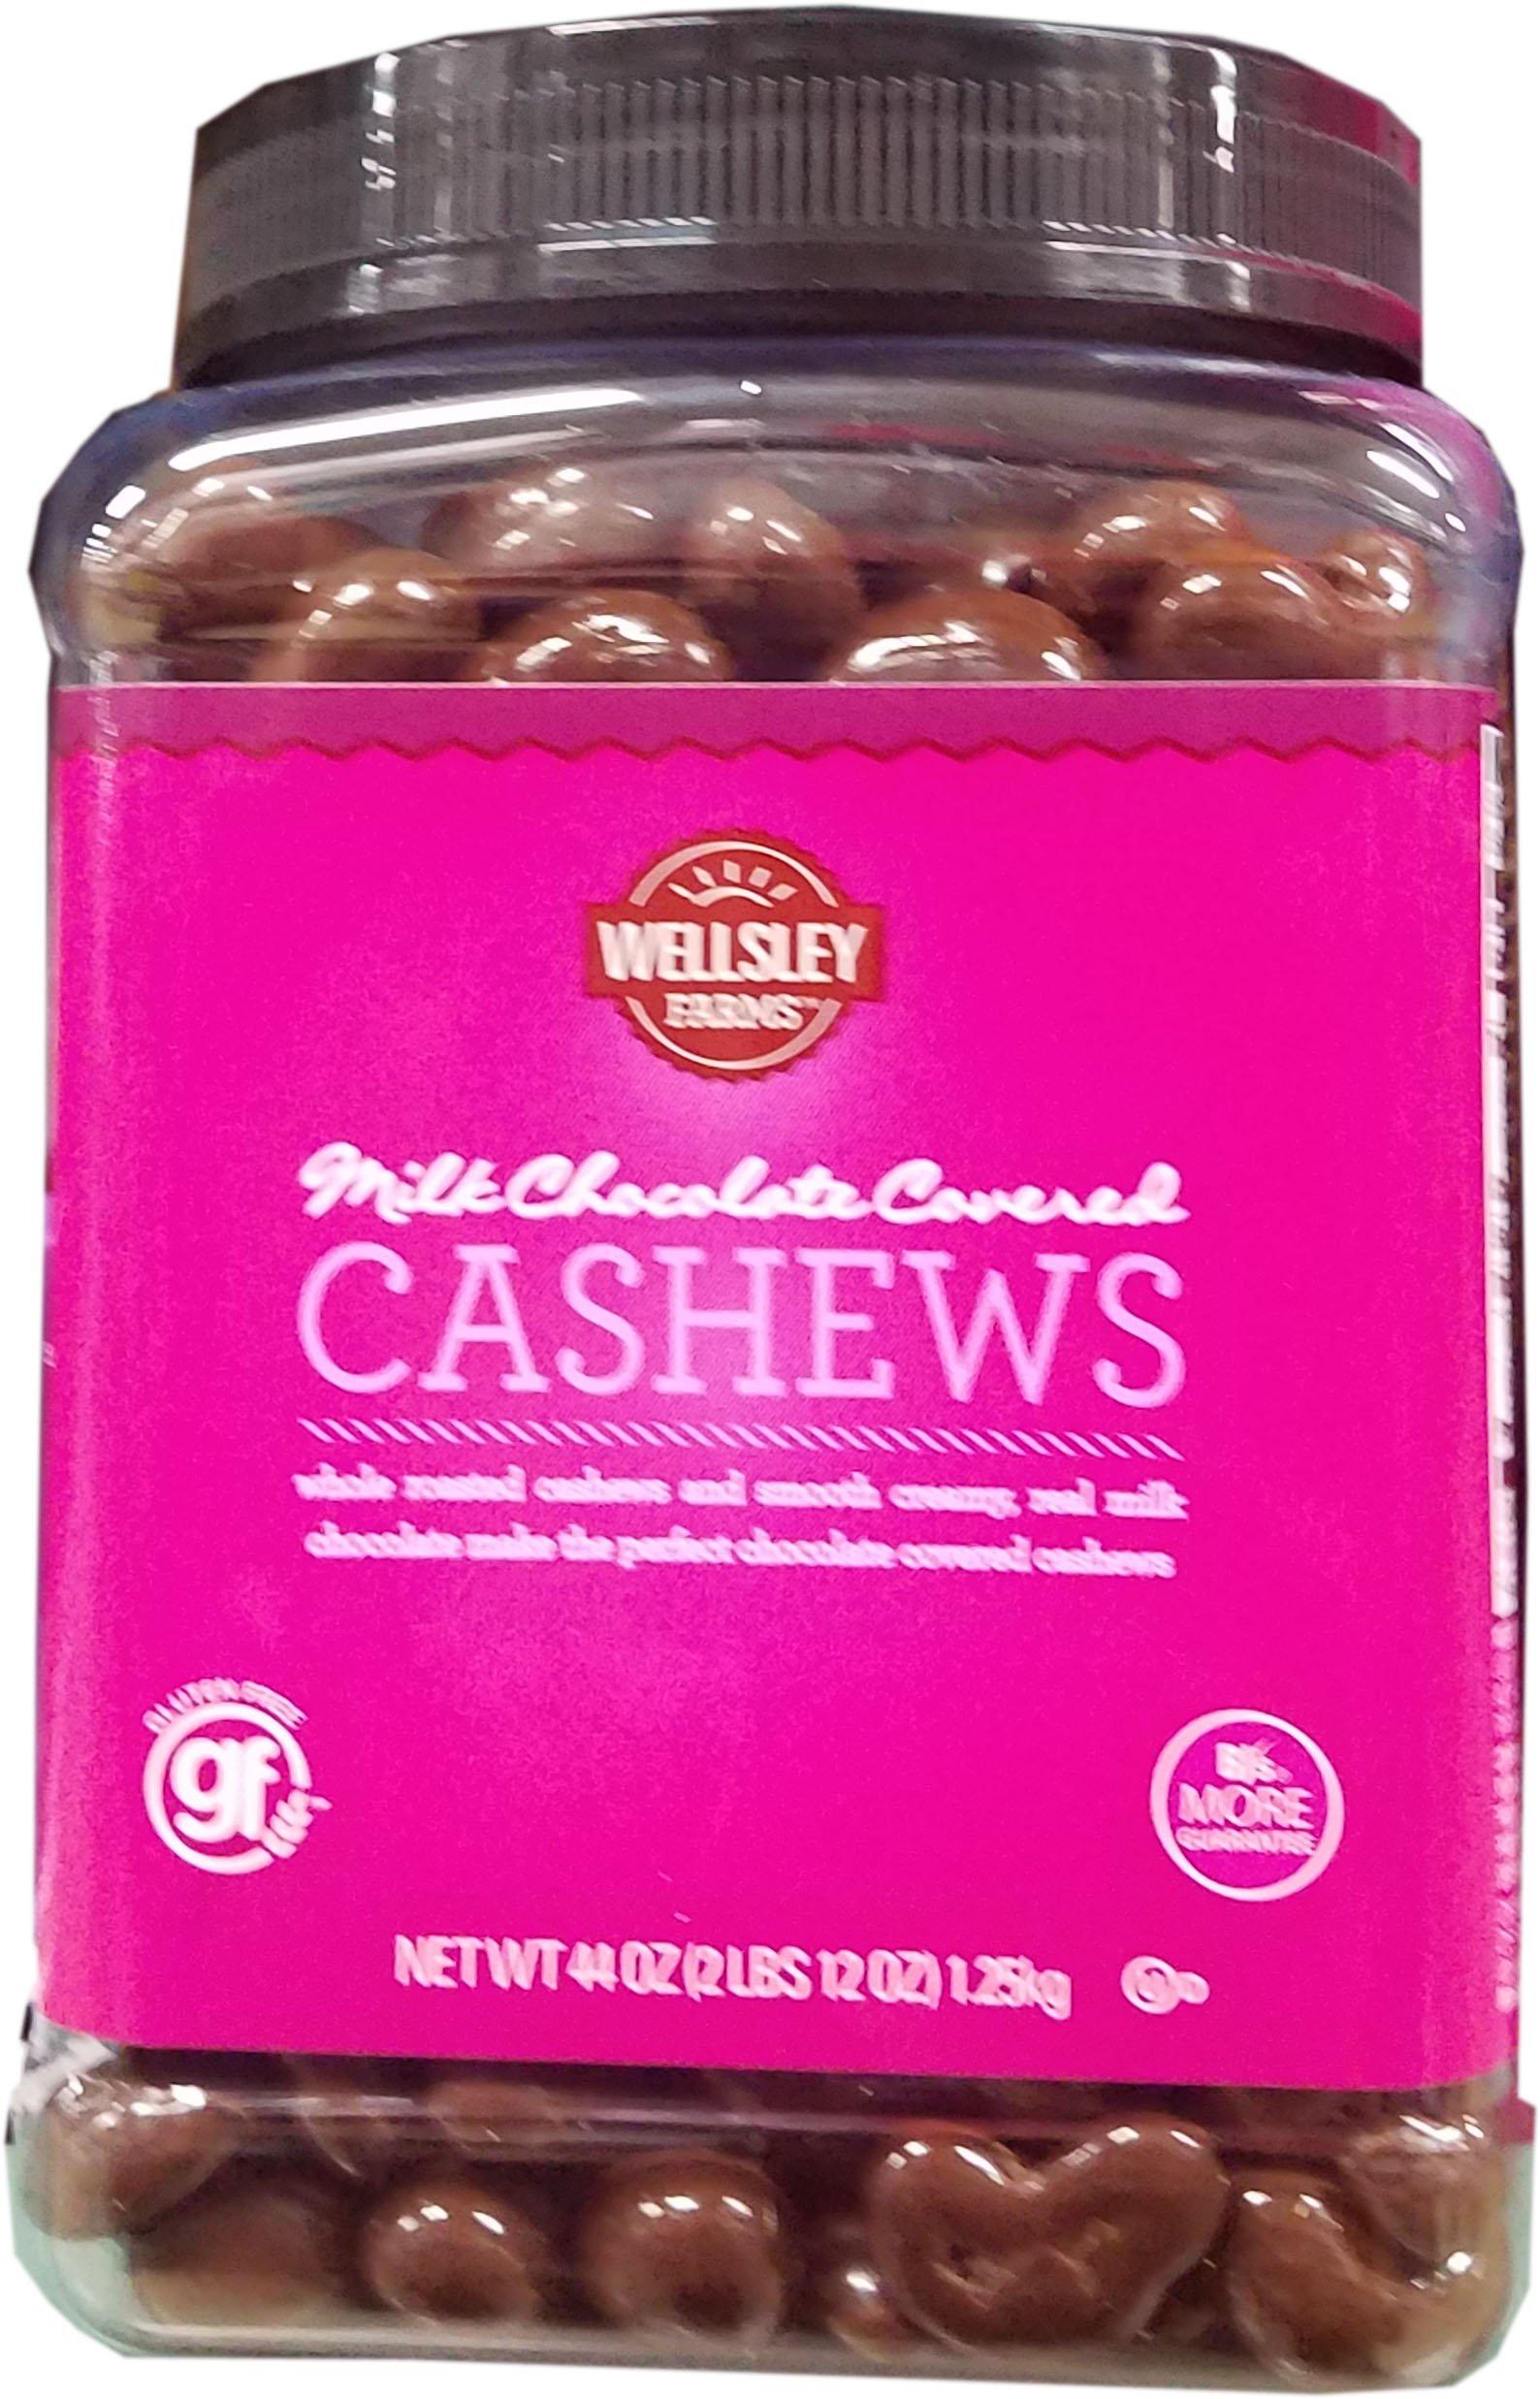 Wellsley Farms Milk Chocolate Covered Cashews, 44 OZ